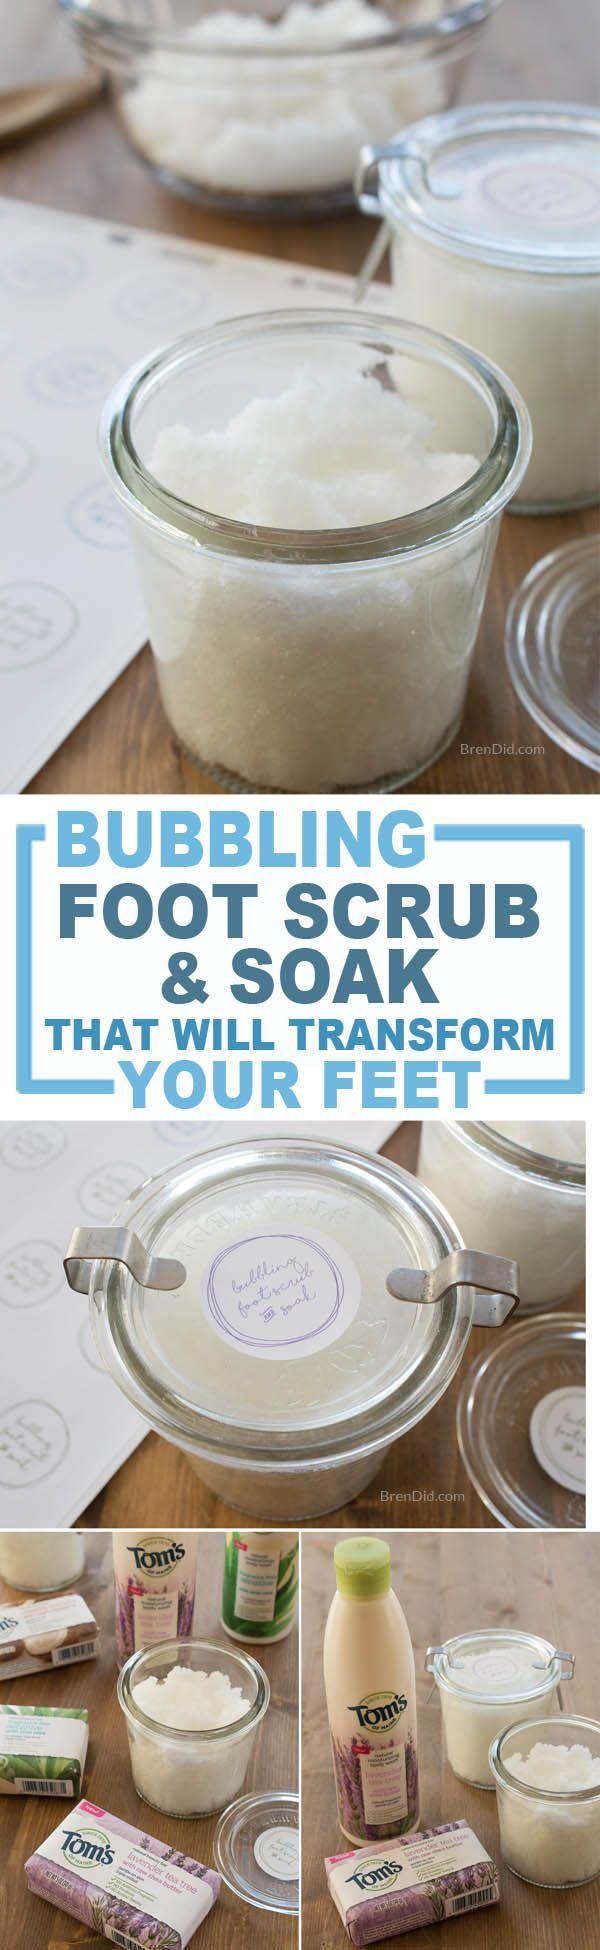 bubbling foot scrub & soak, DIY foot scrub, homemade foot scrub, DIY callus remover, dry skin, homemade foot soak, #naturallyinspired #sponsored via /brendidblog/ /target/ @TomsofMaine